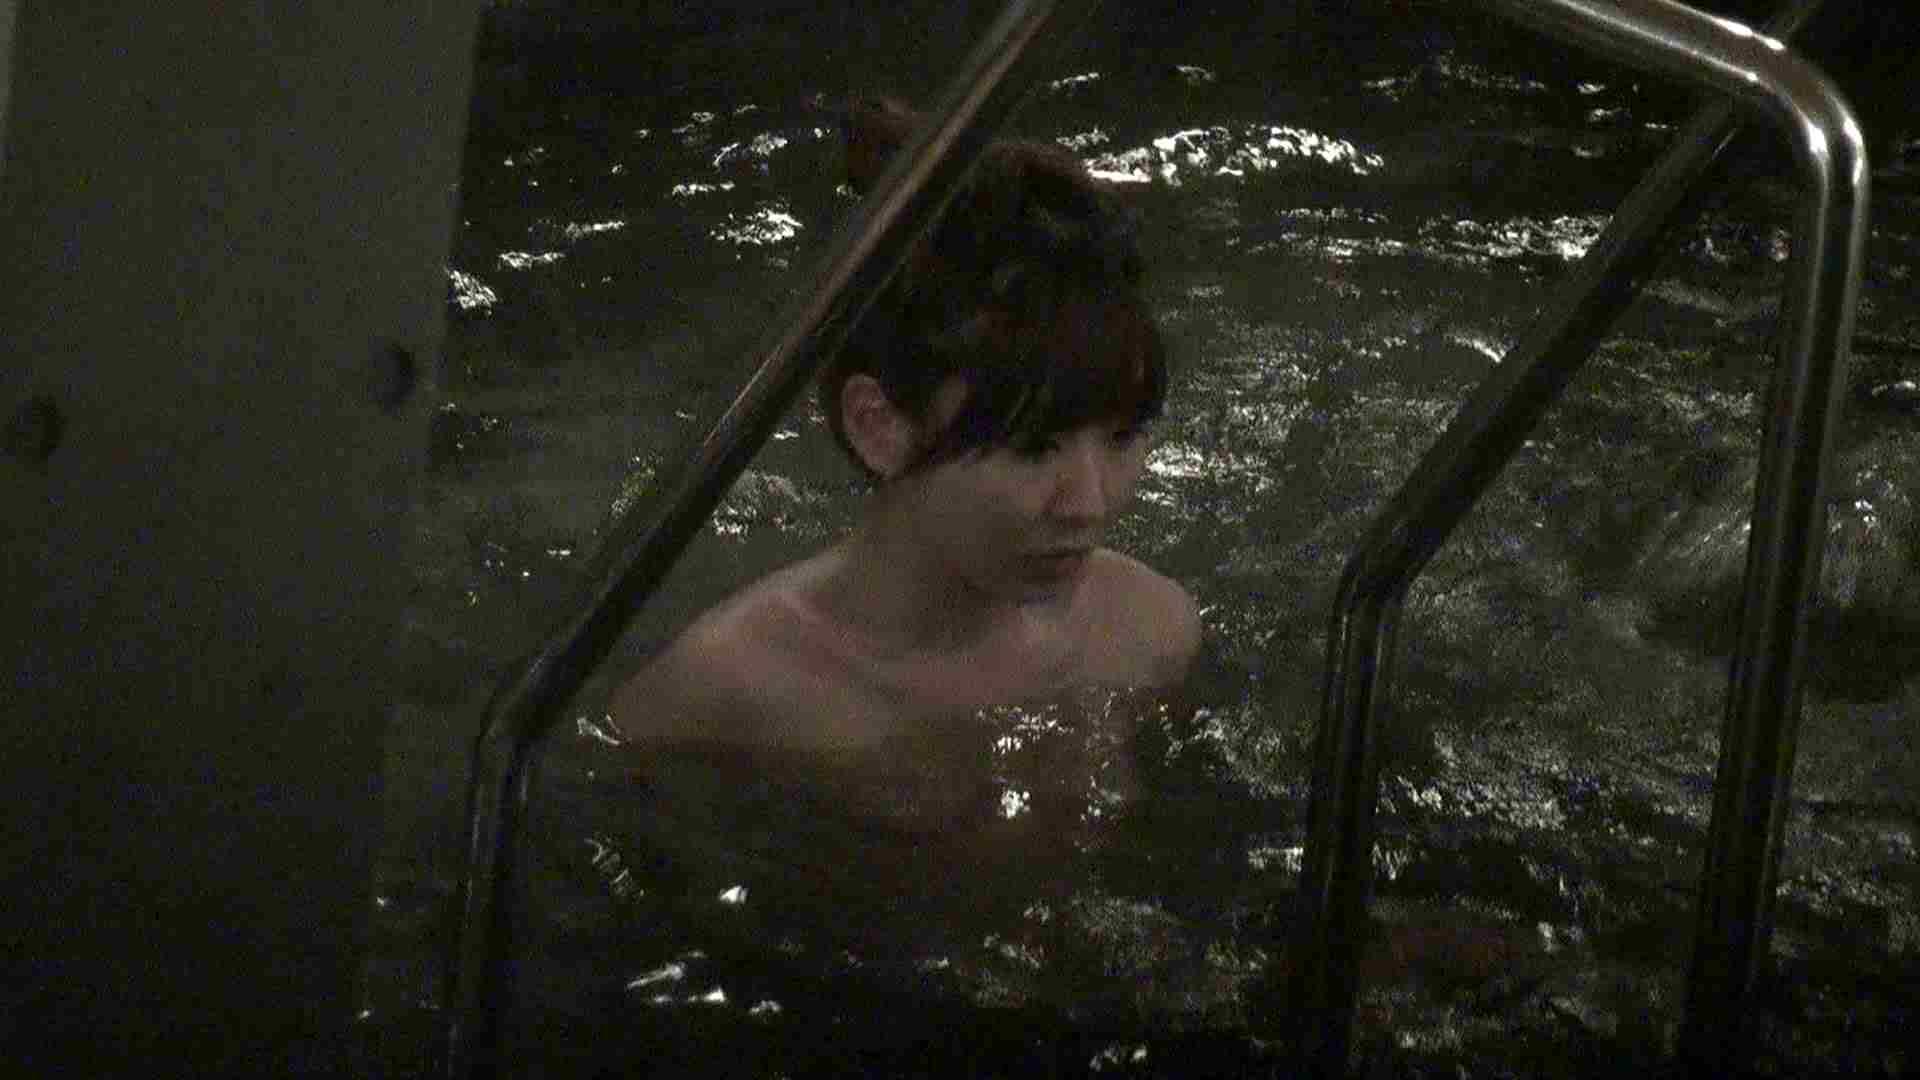 Aquaな露天風呂Vol.410 エッチな盗撮 AV無料動画キャプチャ 76pic 74